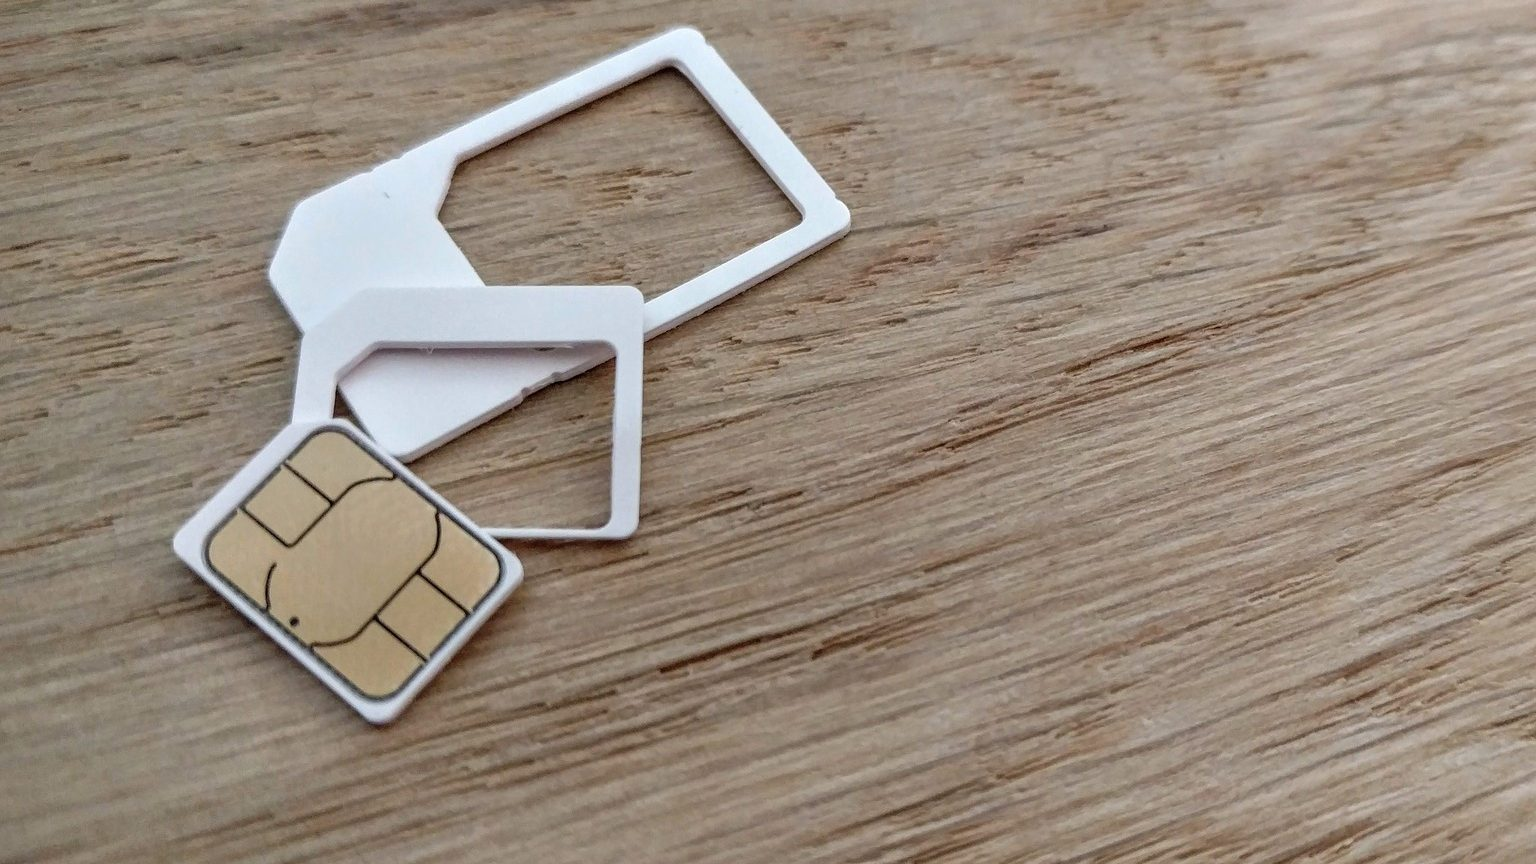 SIM card on table